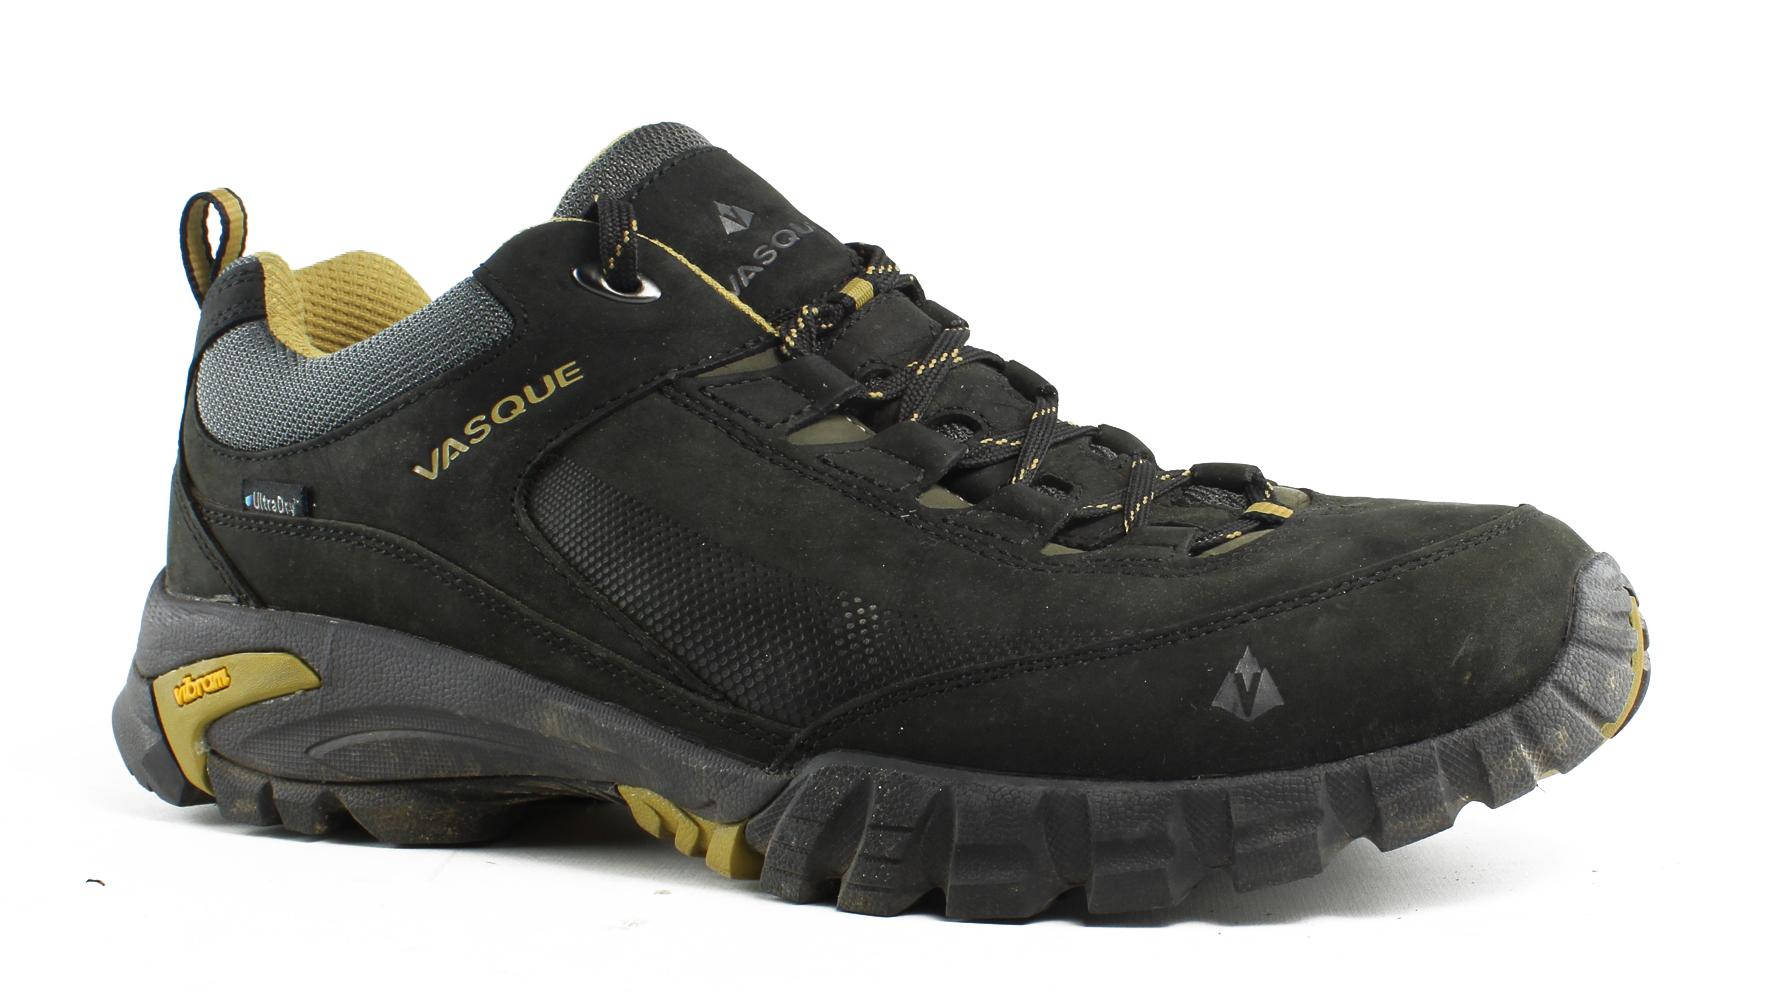 Vasque hommes Talus Trek Low Ultradry noir /DriedTobacco Trail / Hiking Chaussures Size